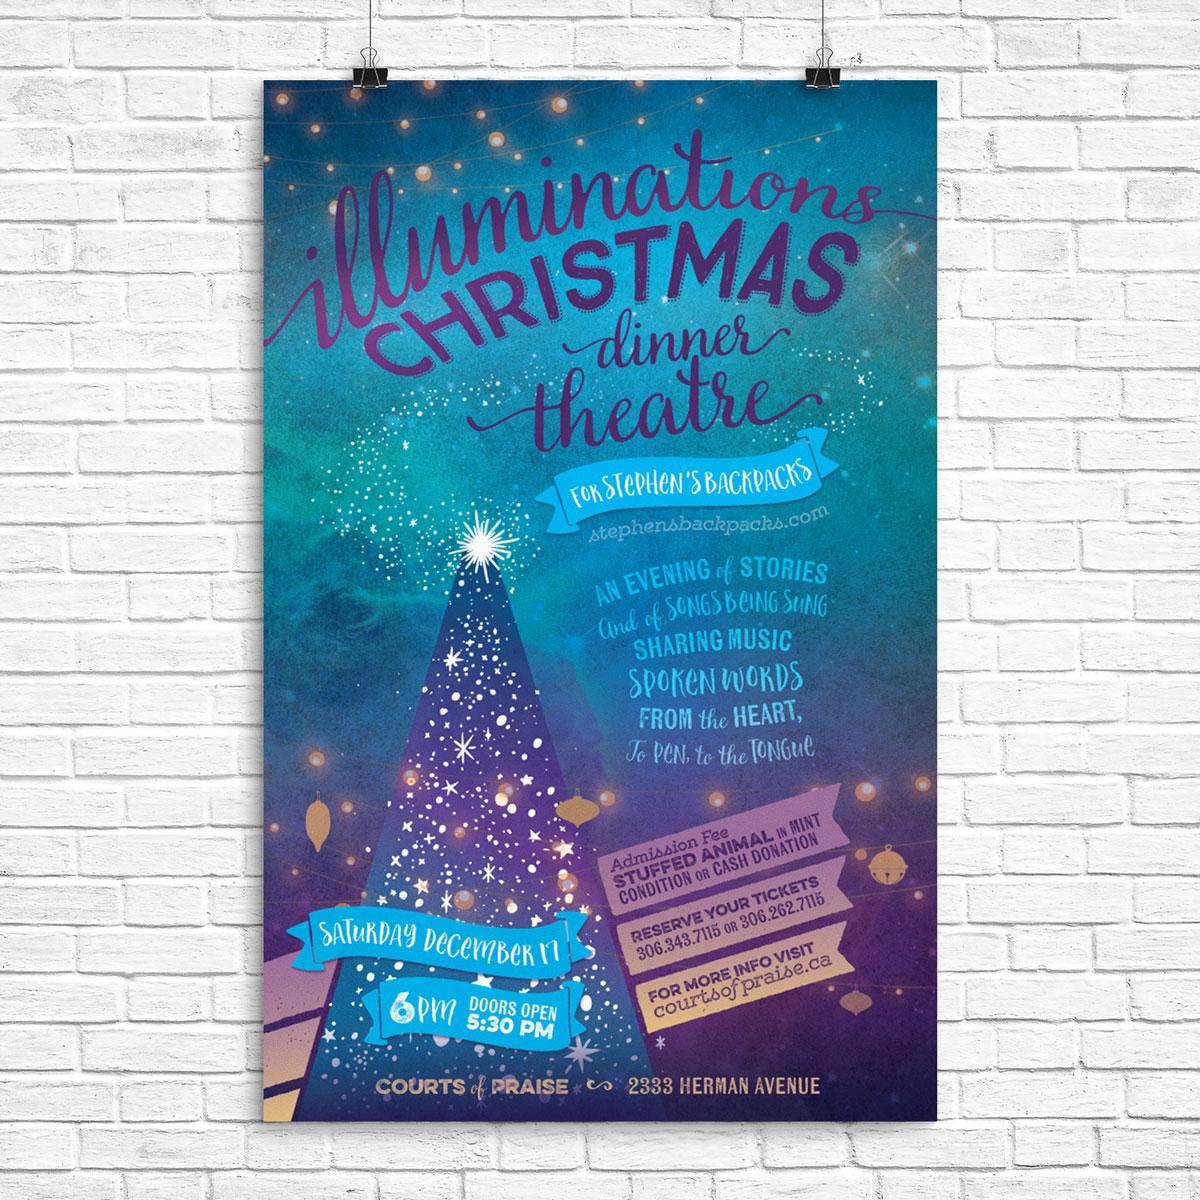 Christmas2016-Poster-BrickWall.jpg